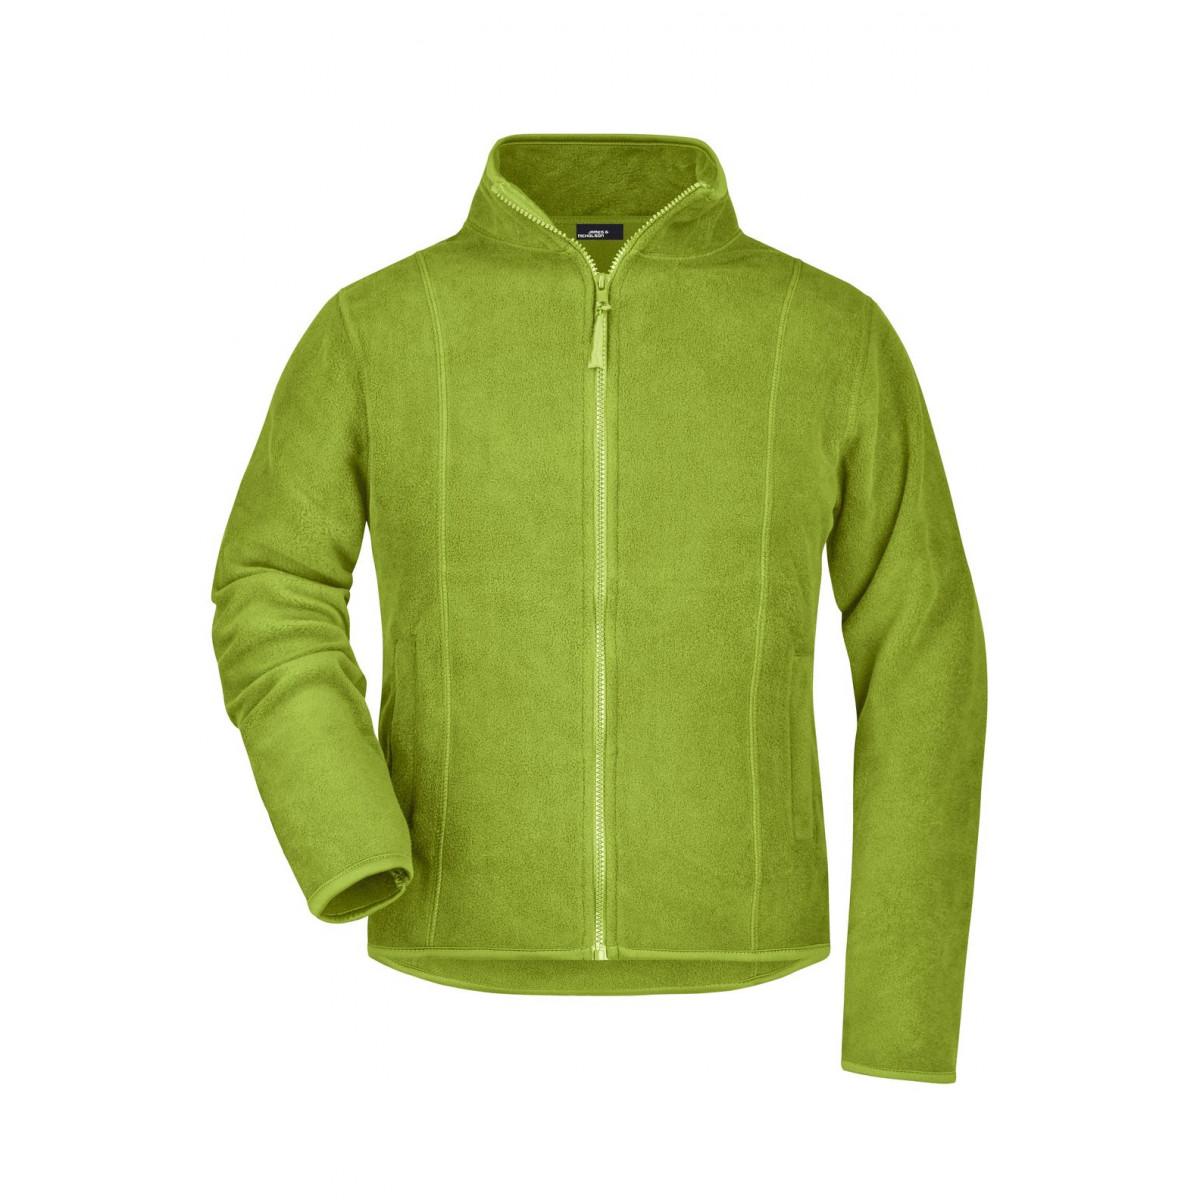 Толстовка женская JN049 Girly Microfleece Jacket - Лайм